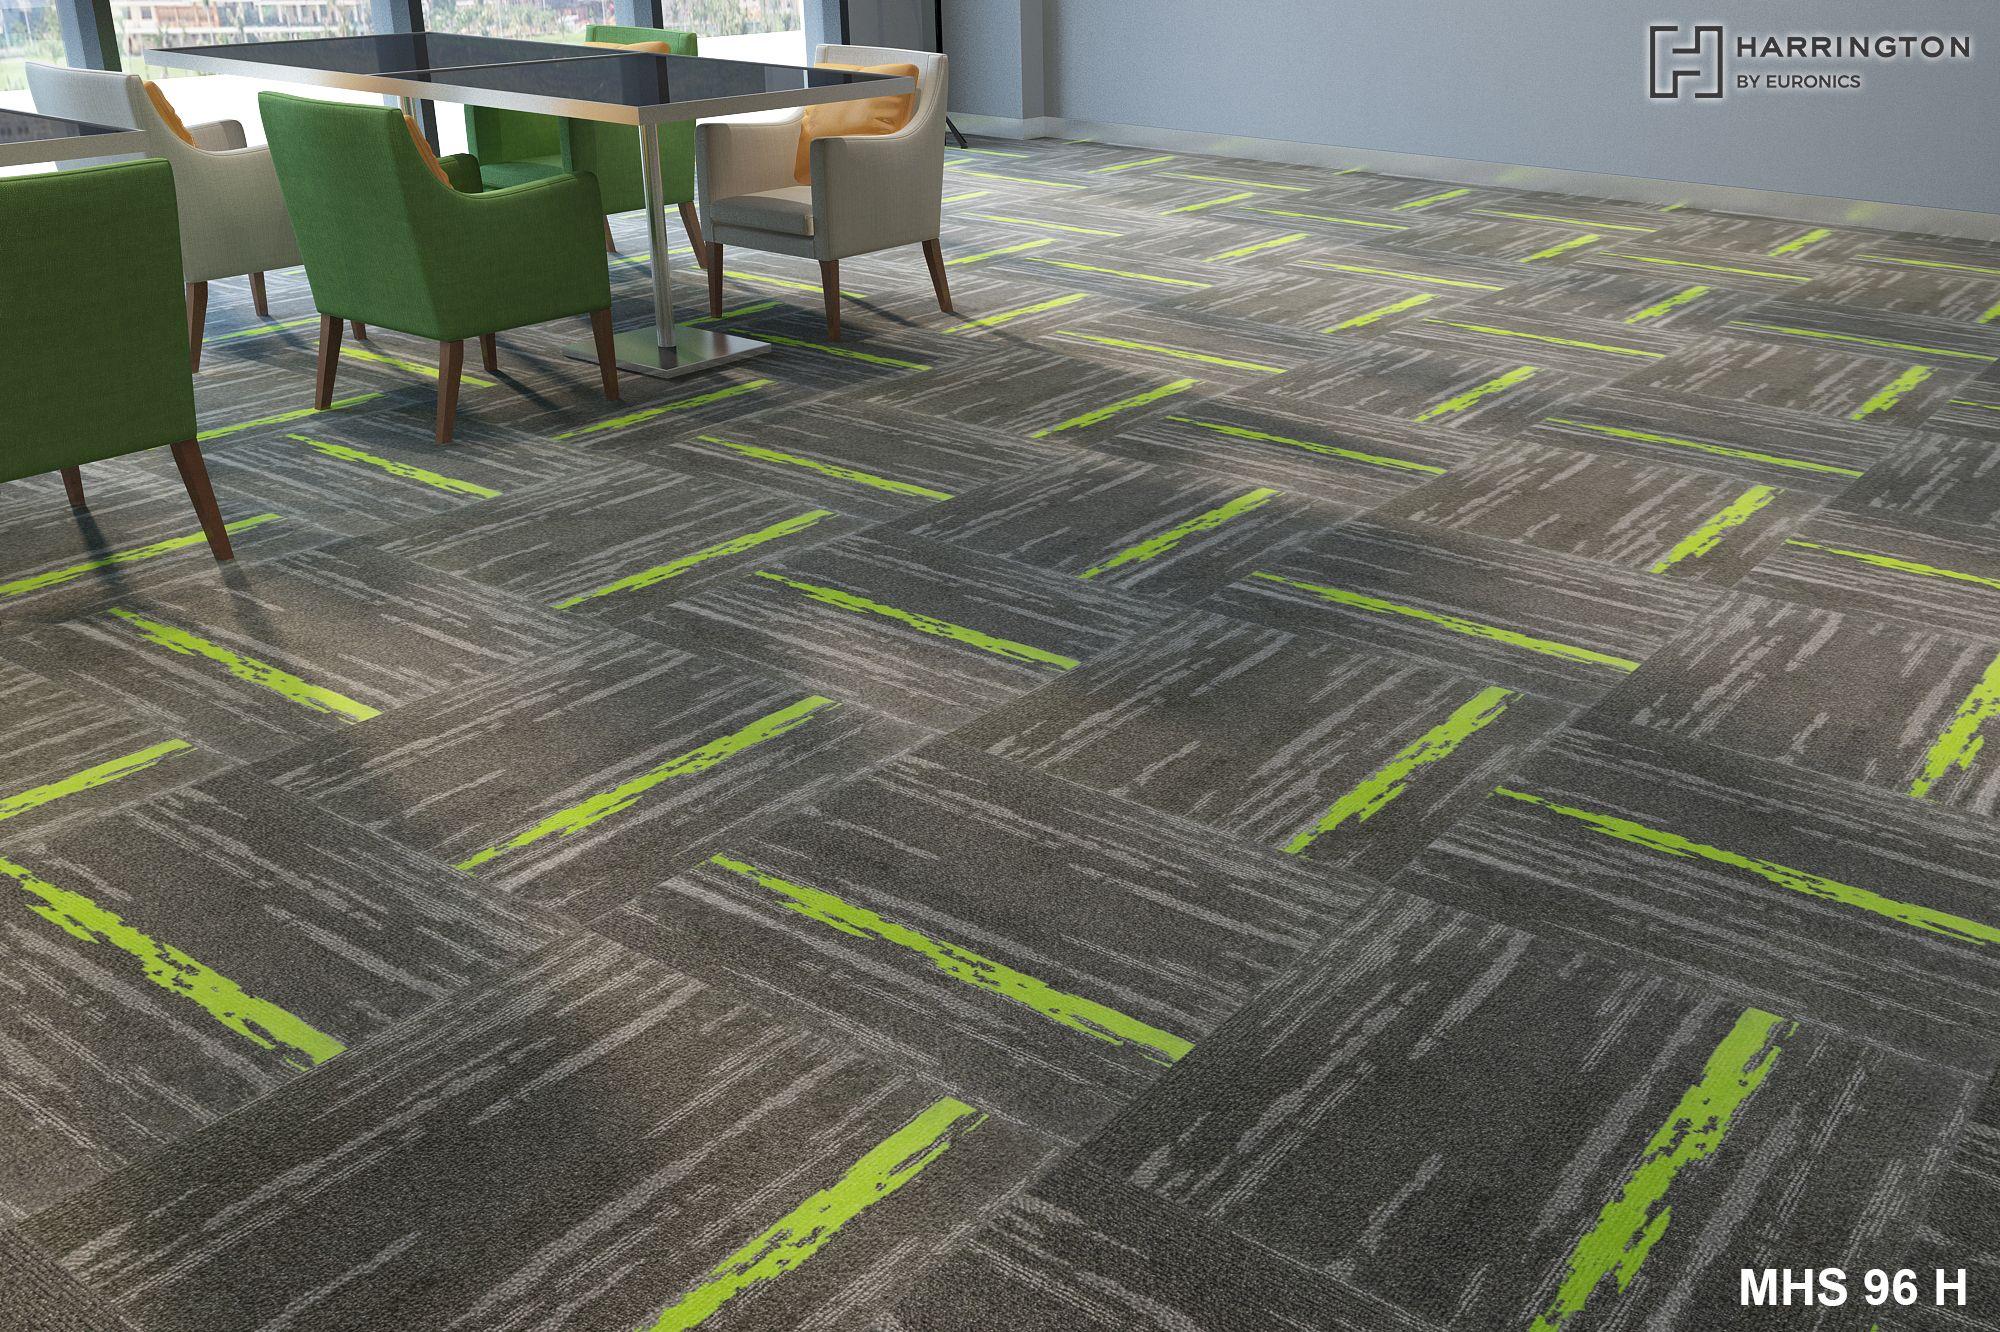 Carpet Tiles Carpet Planks By Harrington India Merlin Carpet Tiles Buying Carpet Floor Carpet Tiles